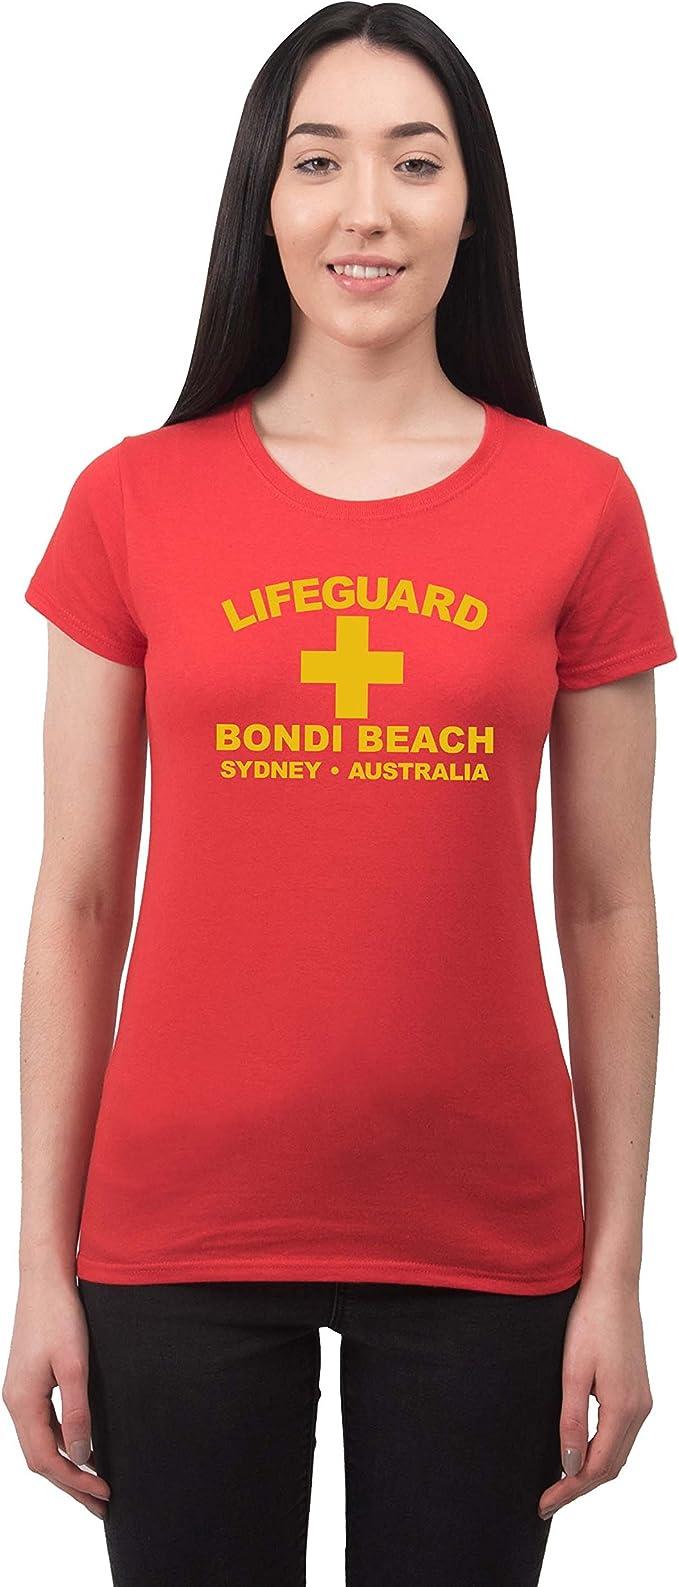 Women S Lifeguard Bondi Beach Sydney Australia Surfer Beach Fancy Dress T Shirt Amazon Co Uk Clothing